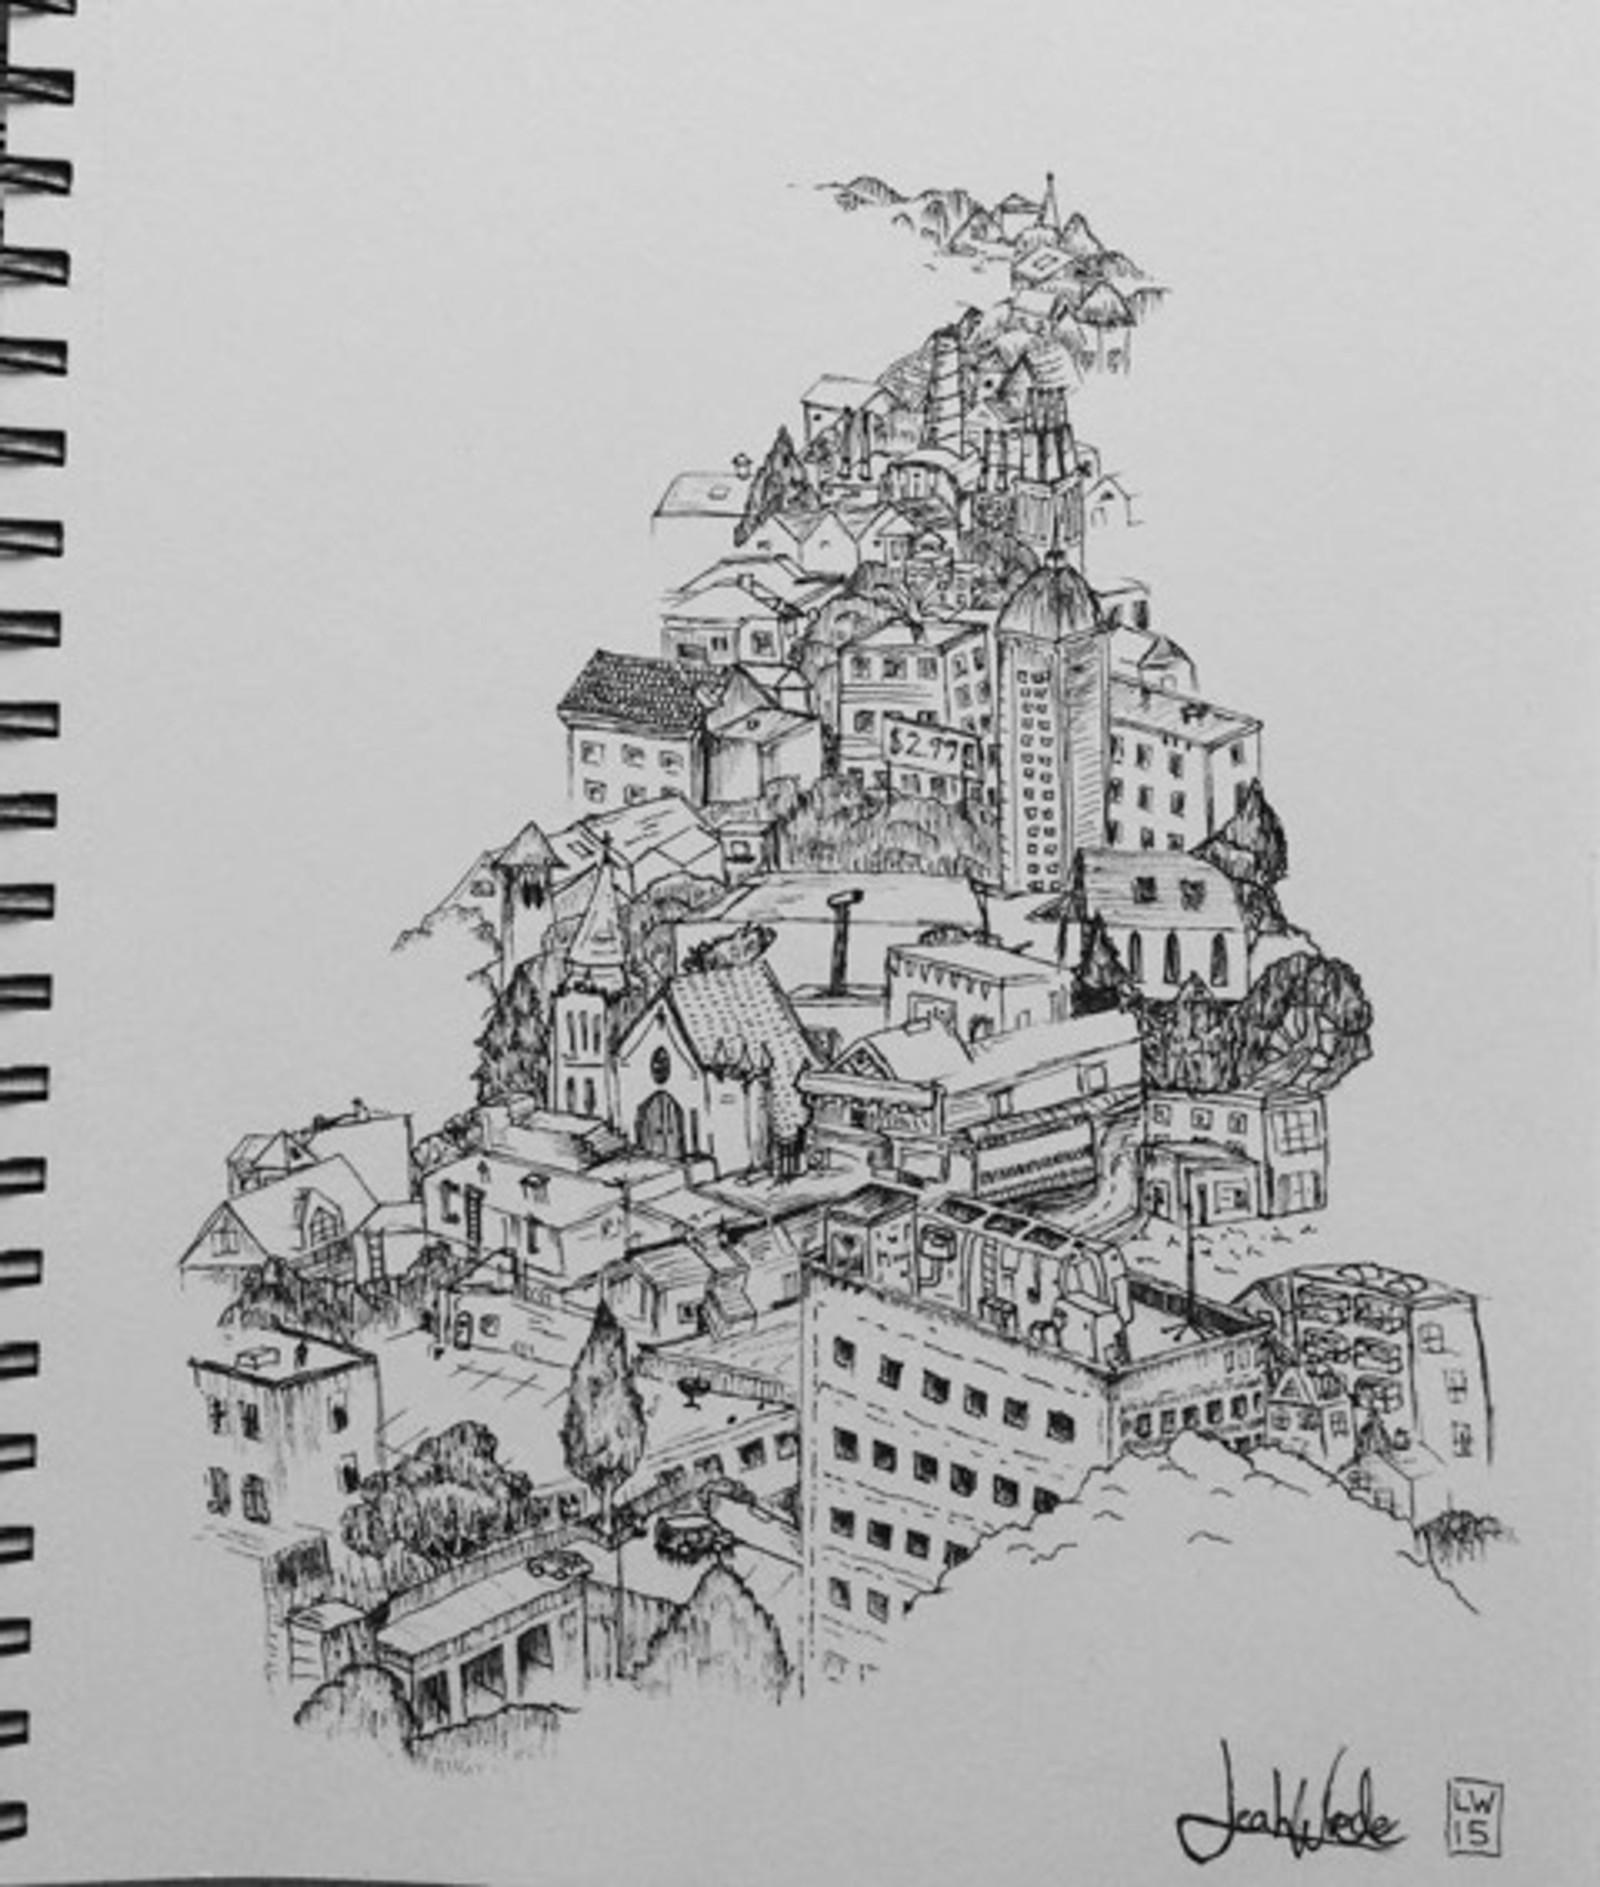 Leah Wrede - Big town